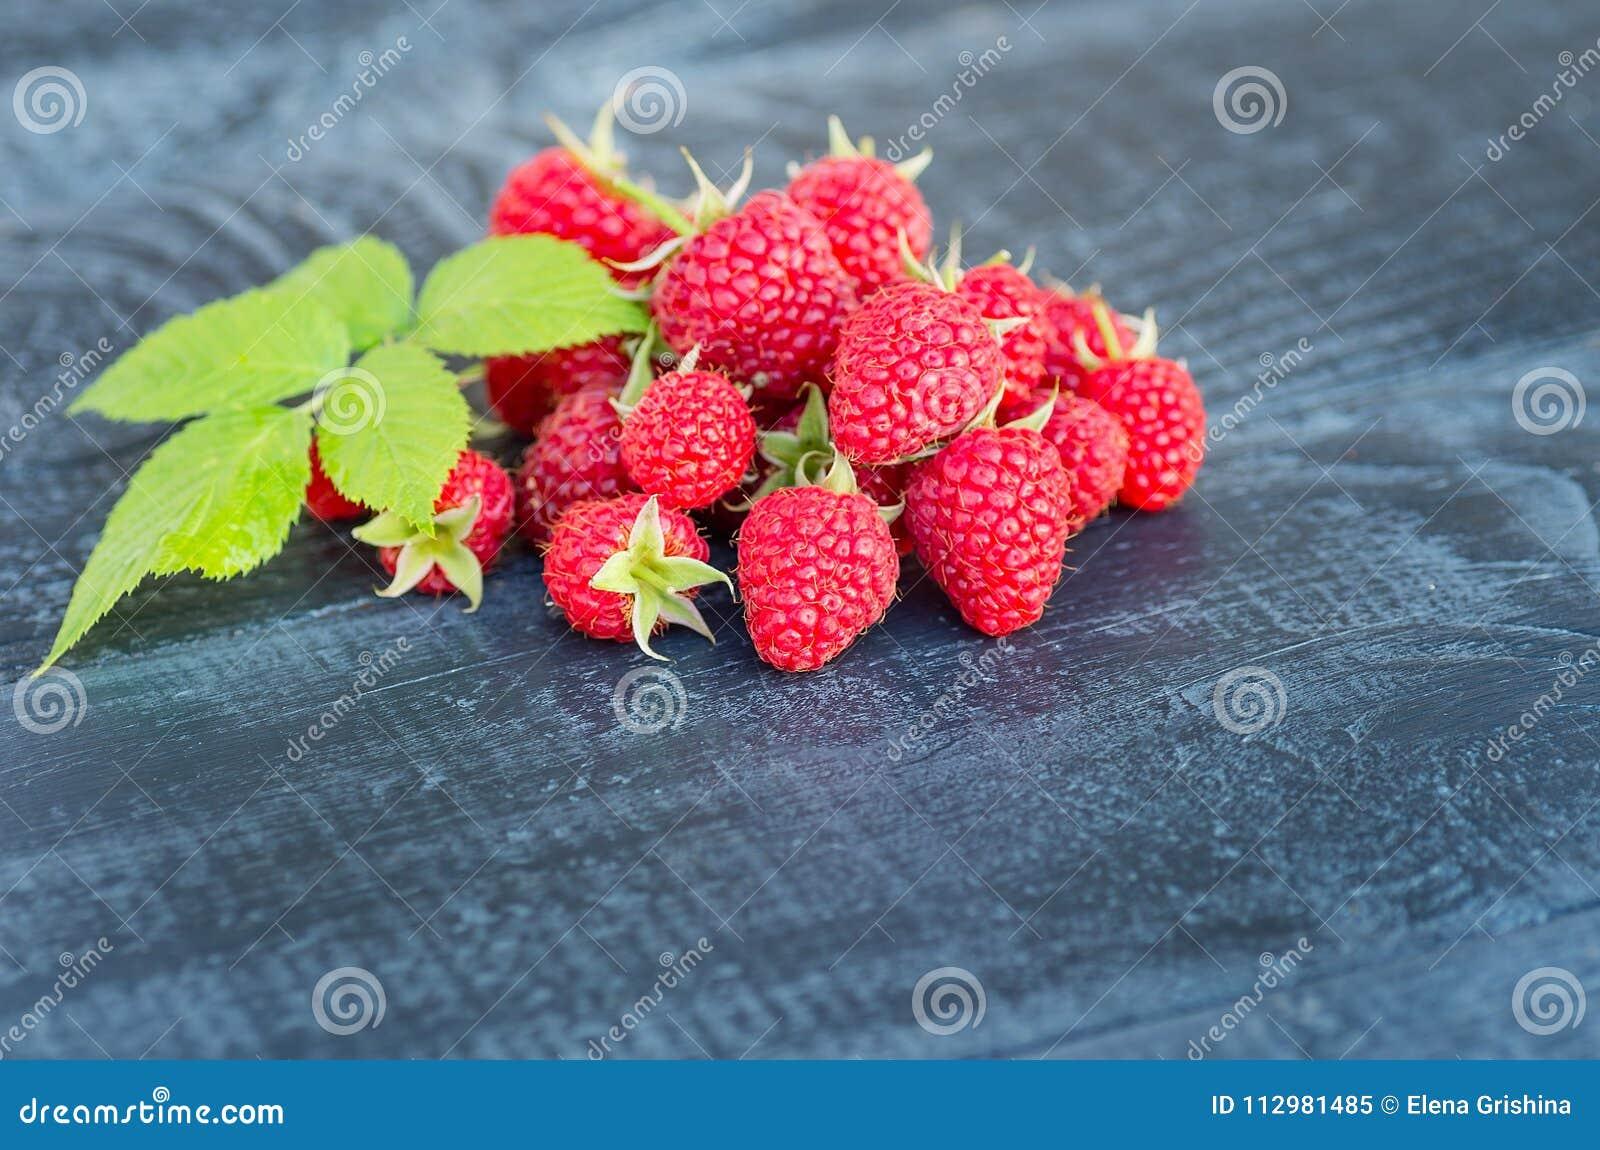 Ripe berries of raspberry garden. Rustic background.